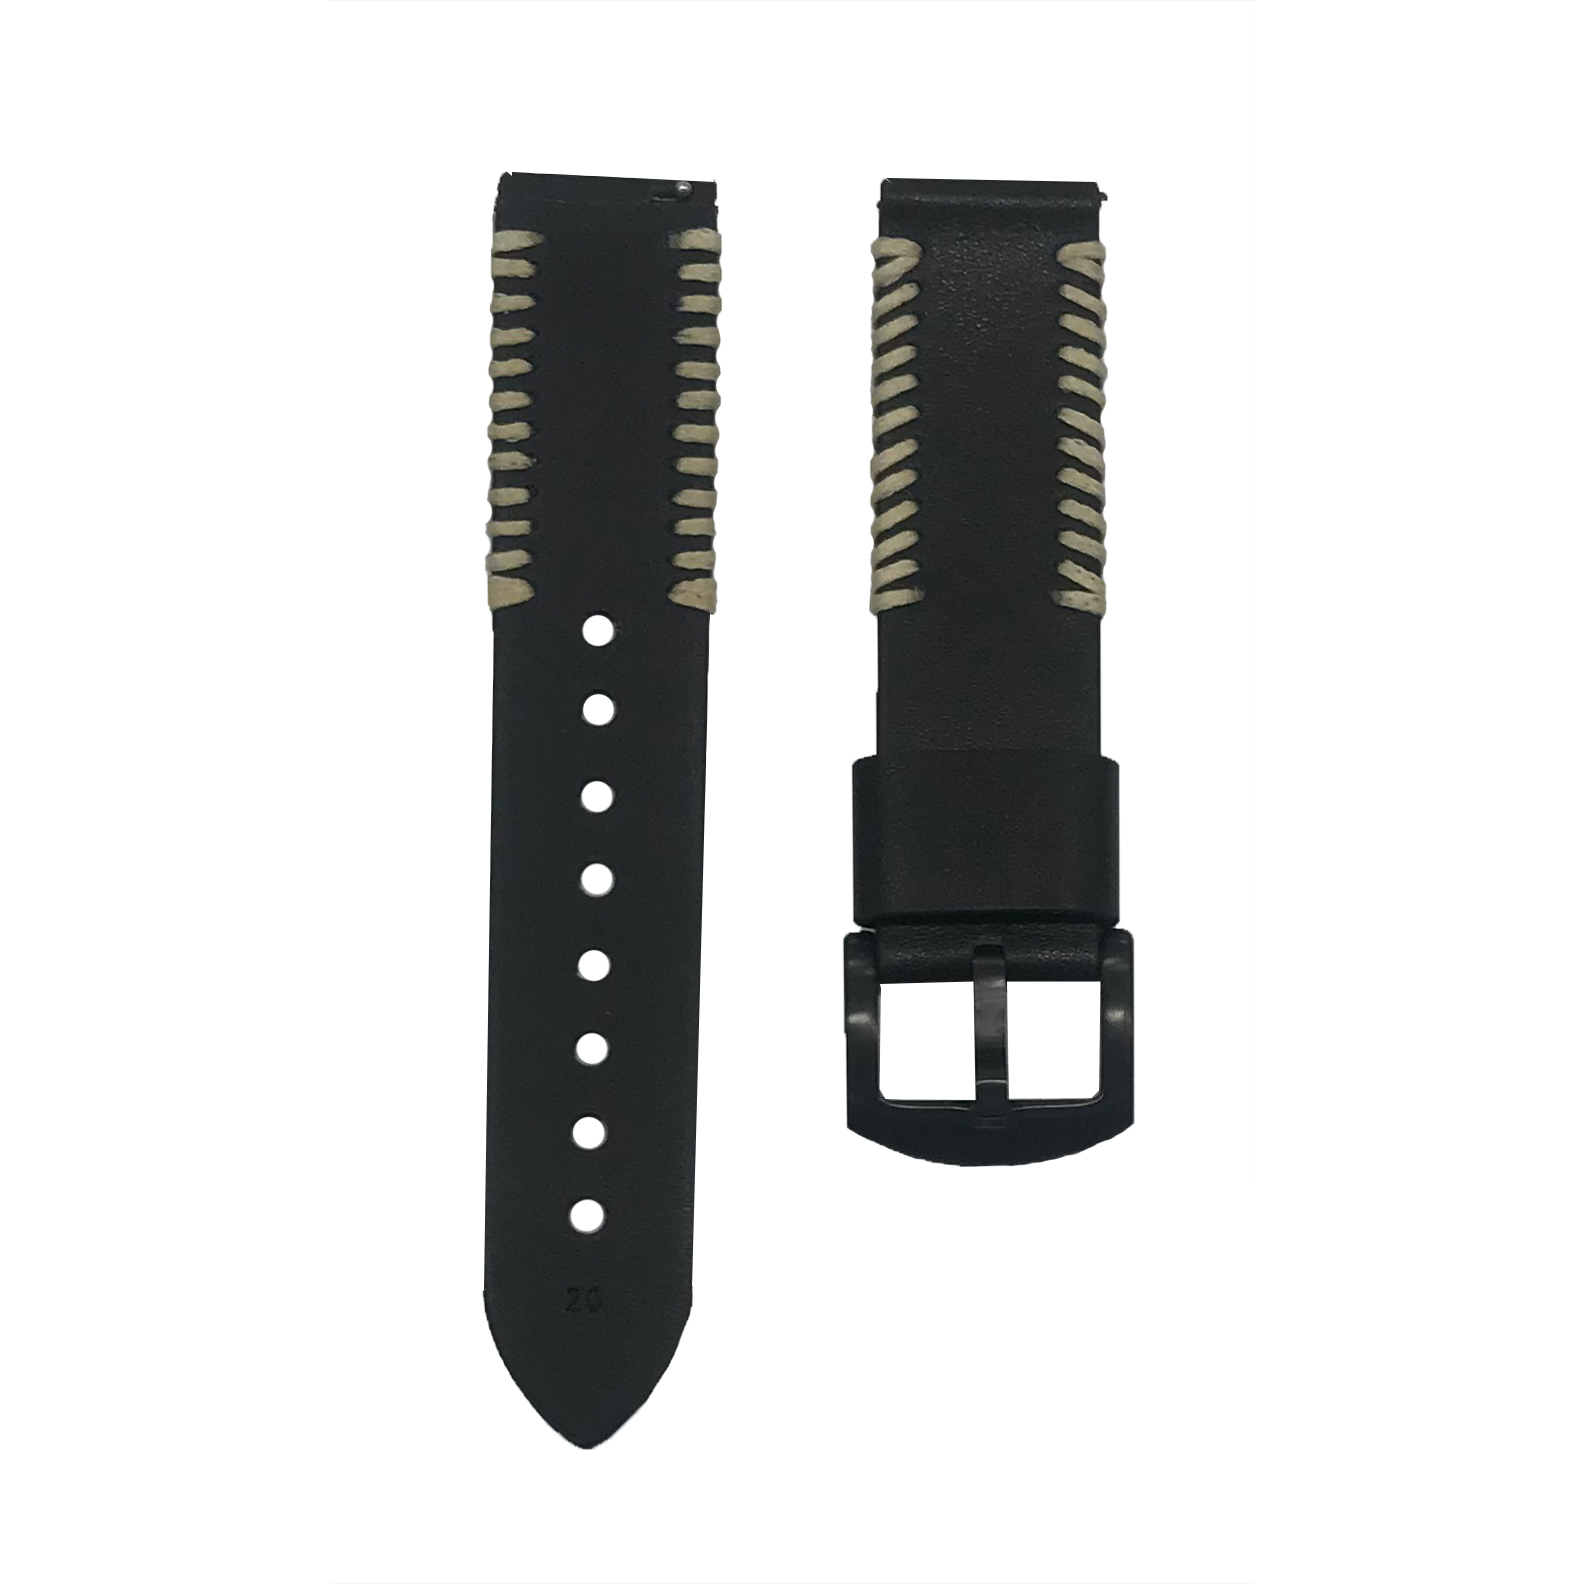 بند مدل CH-03 مناسب برای ساعت هوشمند سامسونگ Gear S2 Classic/Gear Sport/ Galaxy Watch 42mm